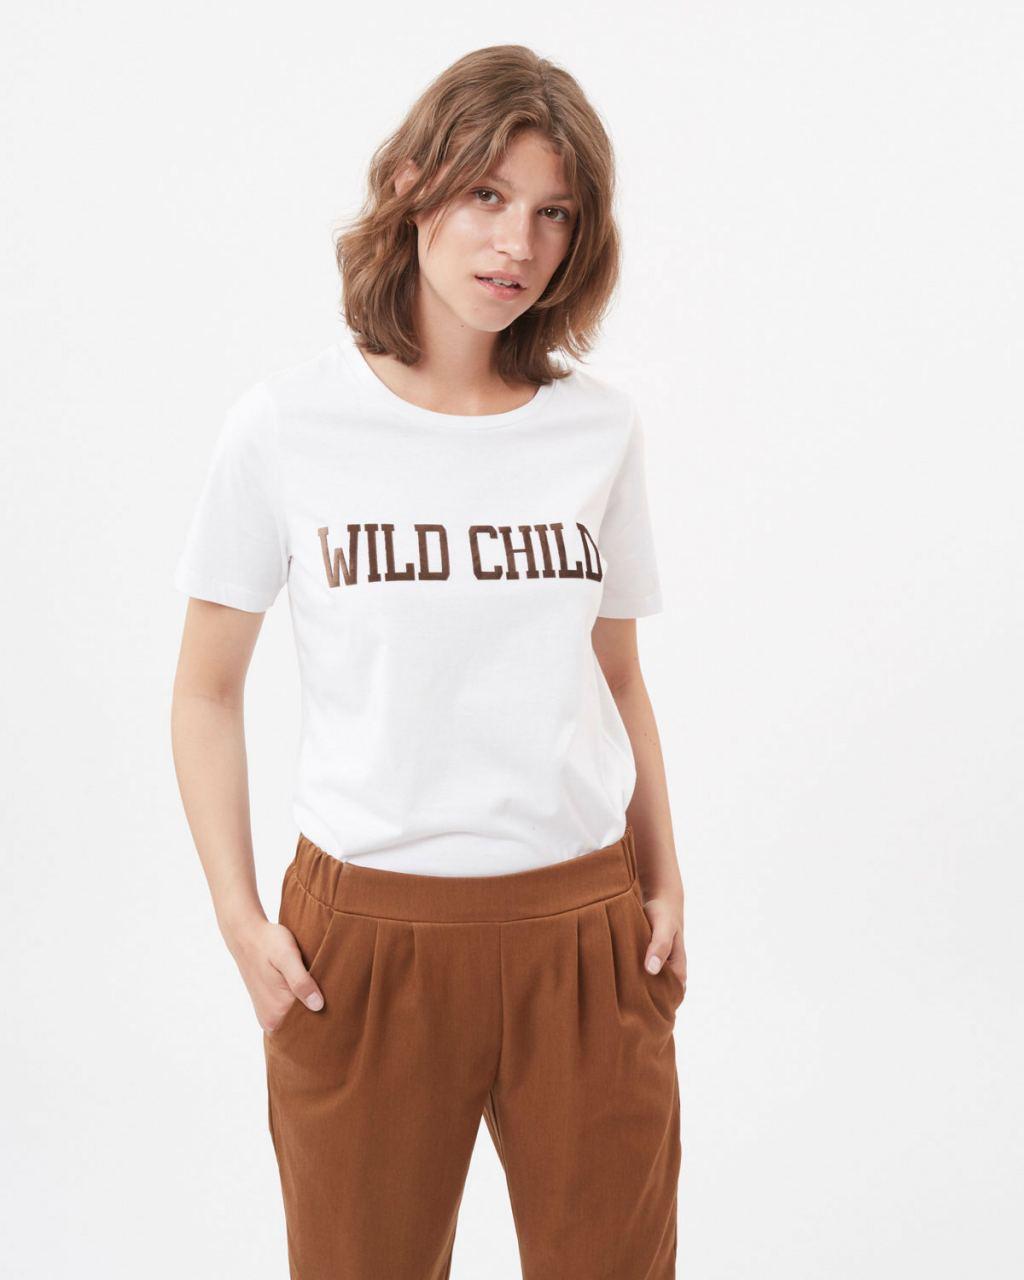 Kimma Wild Child